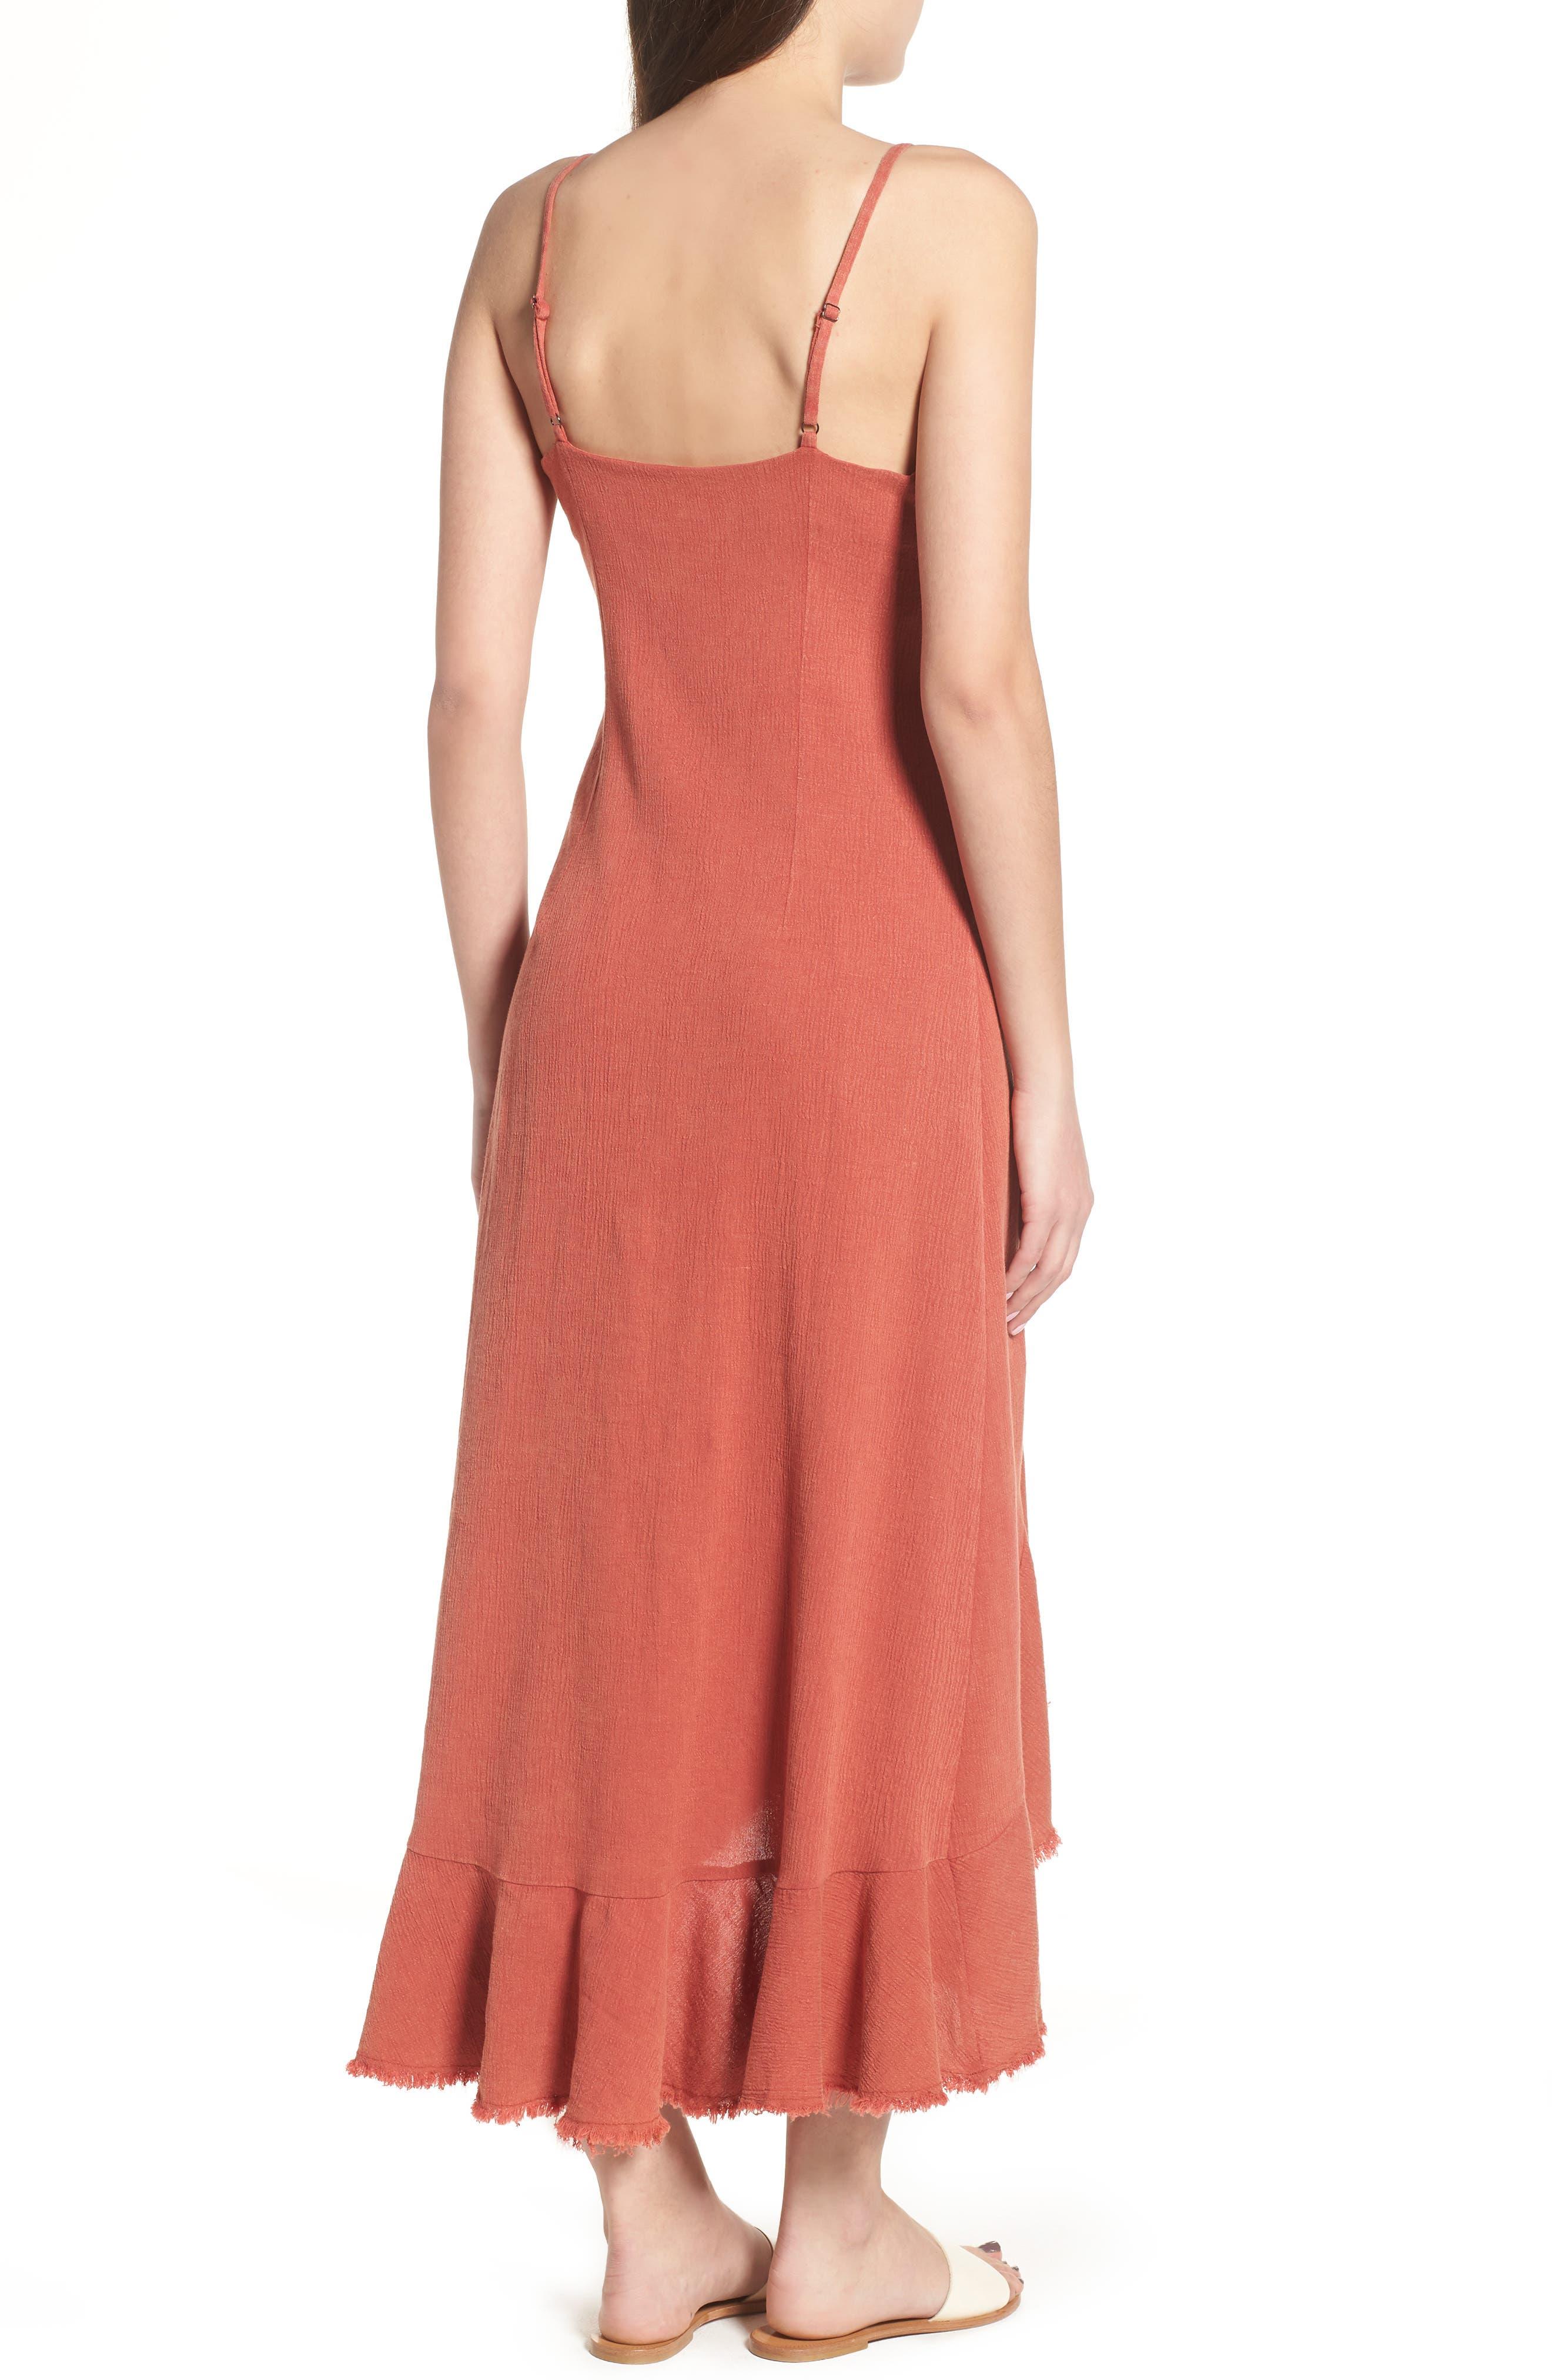 Meet Me in Dreams Flutter Hem Dress,                             Alternate thumbnail 3, color,                             Burnt Orange